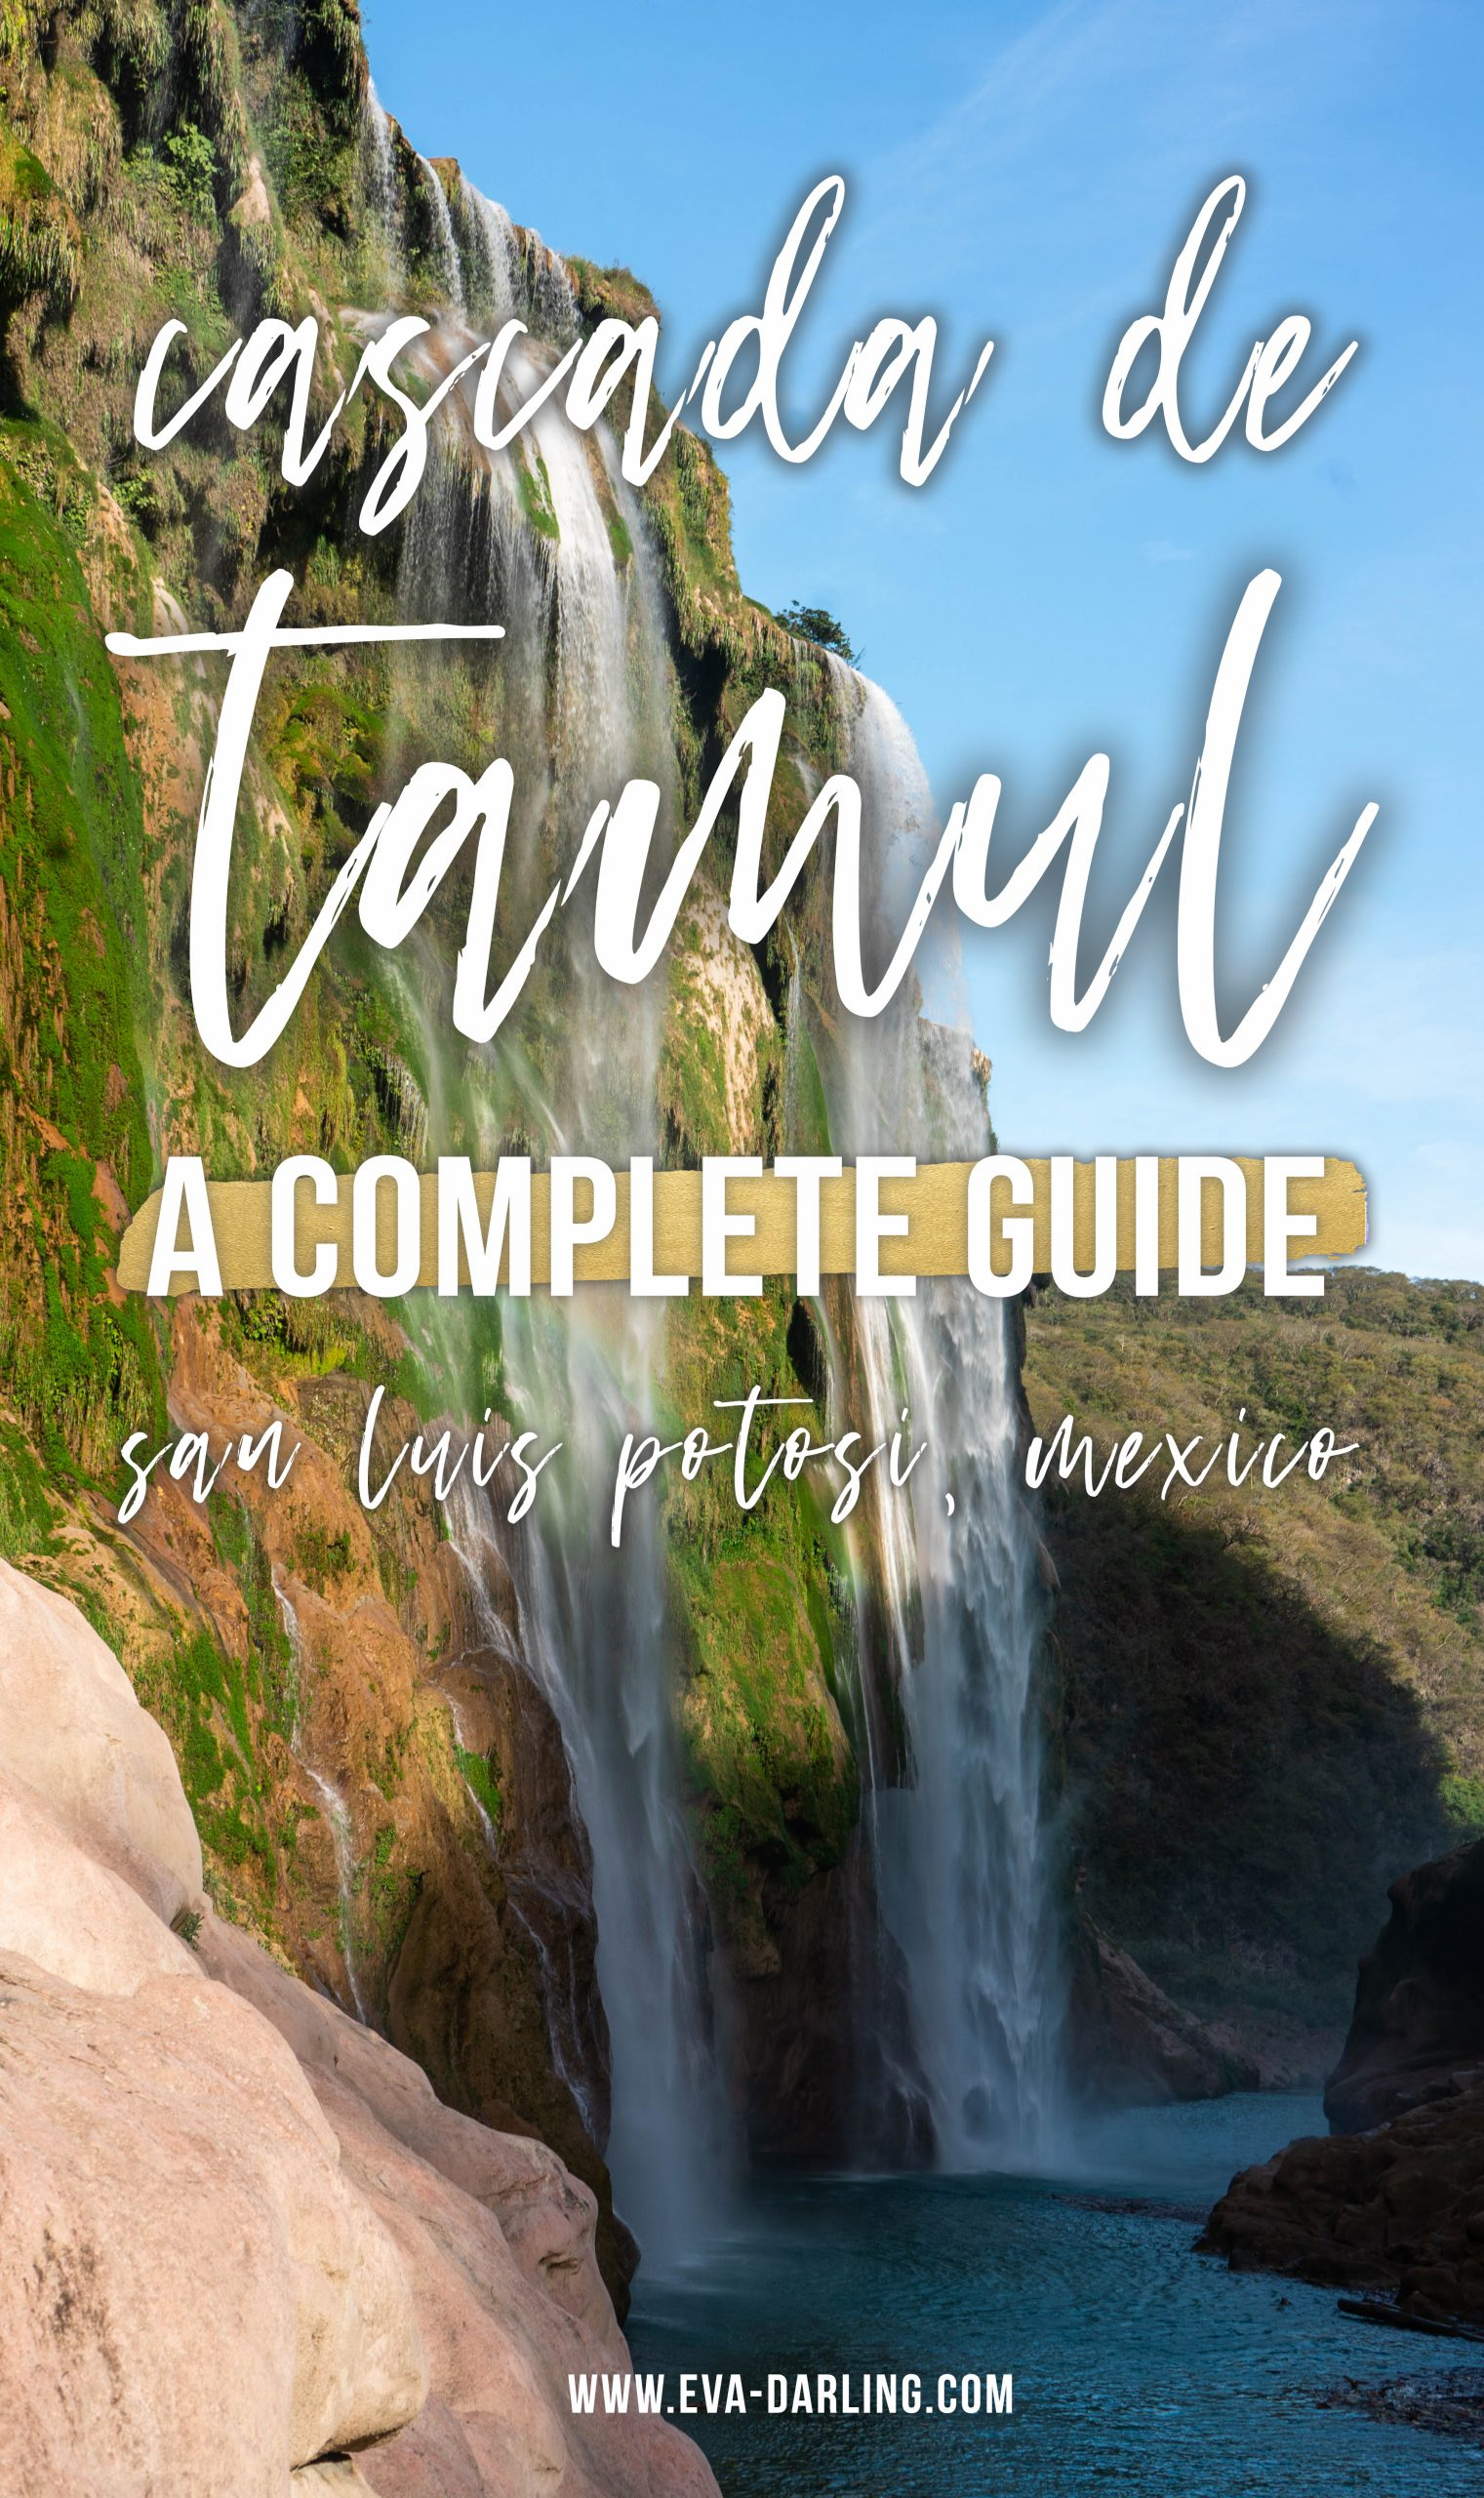 cascada de tamul waterfall travel guide la huasteca potosina san luis potosi mexico rainforest canyon how to visit hiking